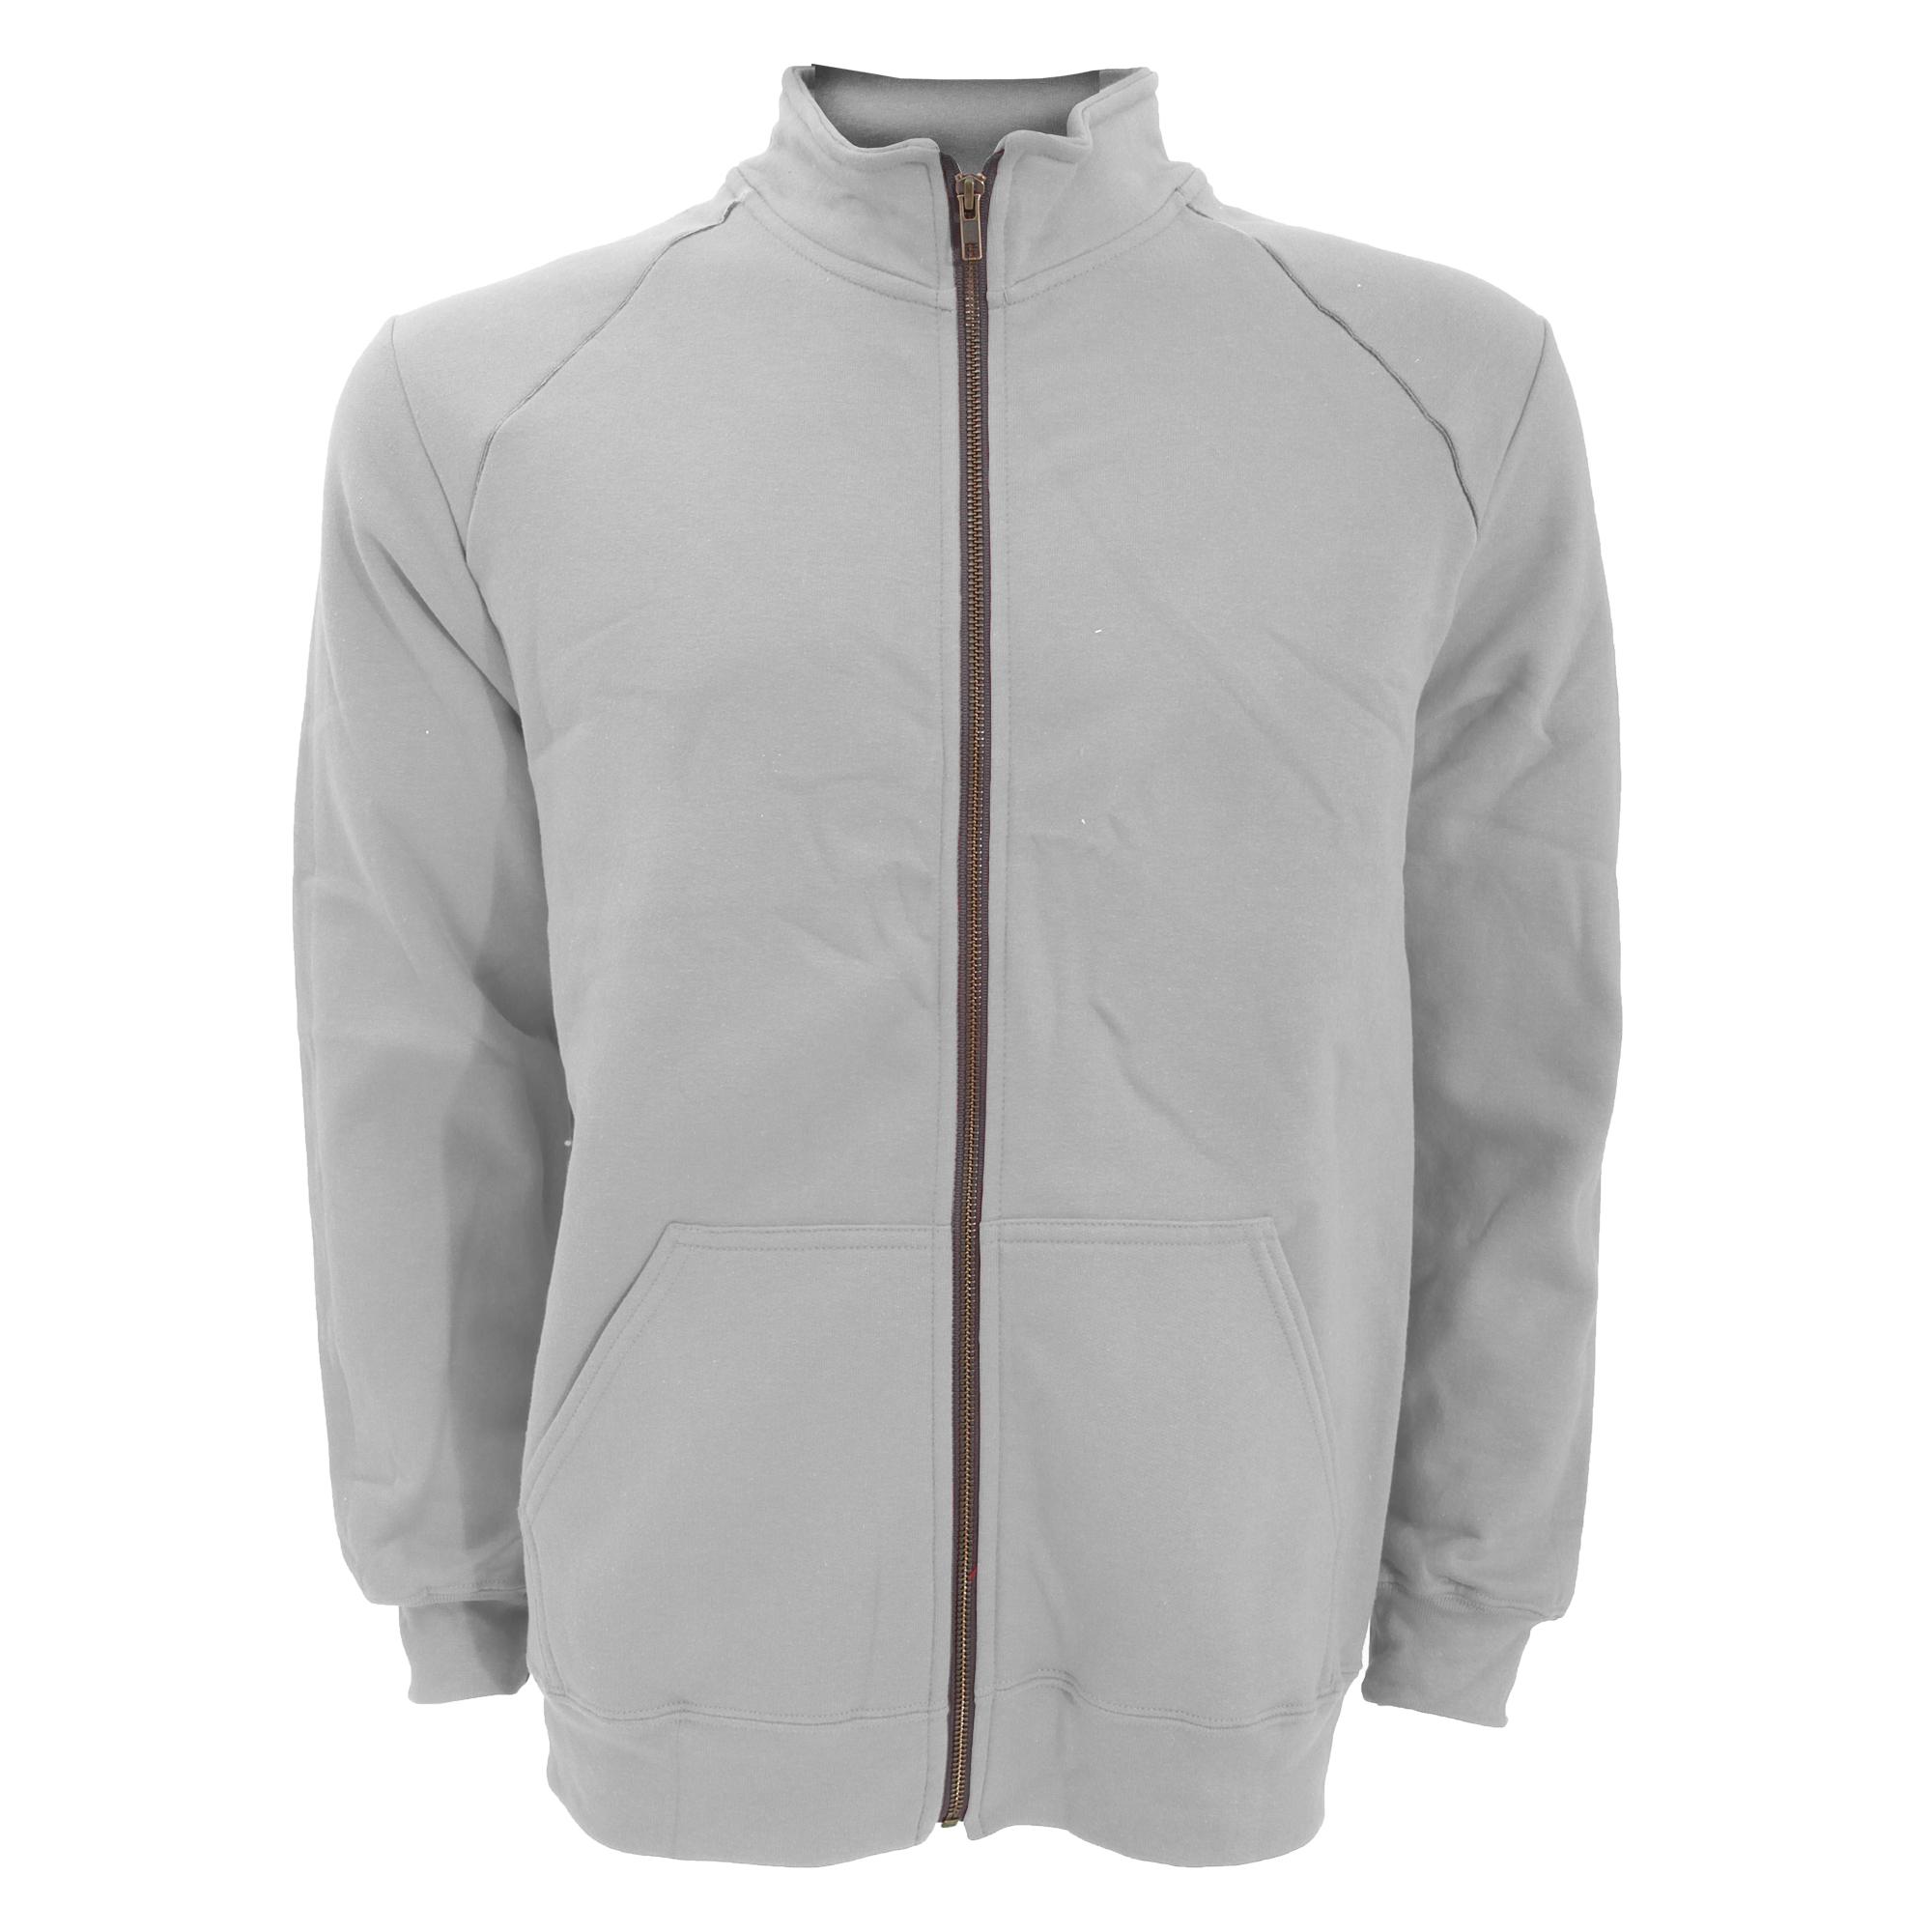 Gildan-Mens-Premium-Cotton-Ringspun-Fleece-Full-Zip-Jacket-L-S-M-2XL-RW3172 thumbnail 5